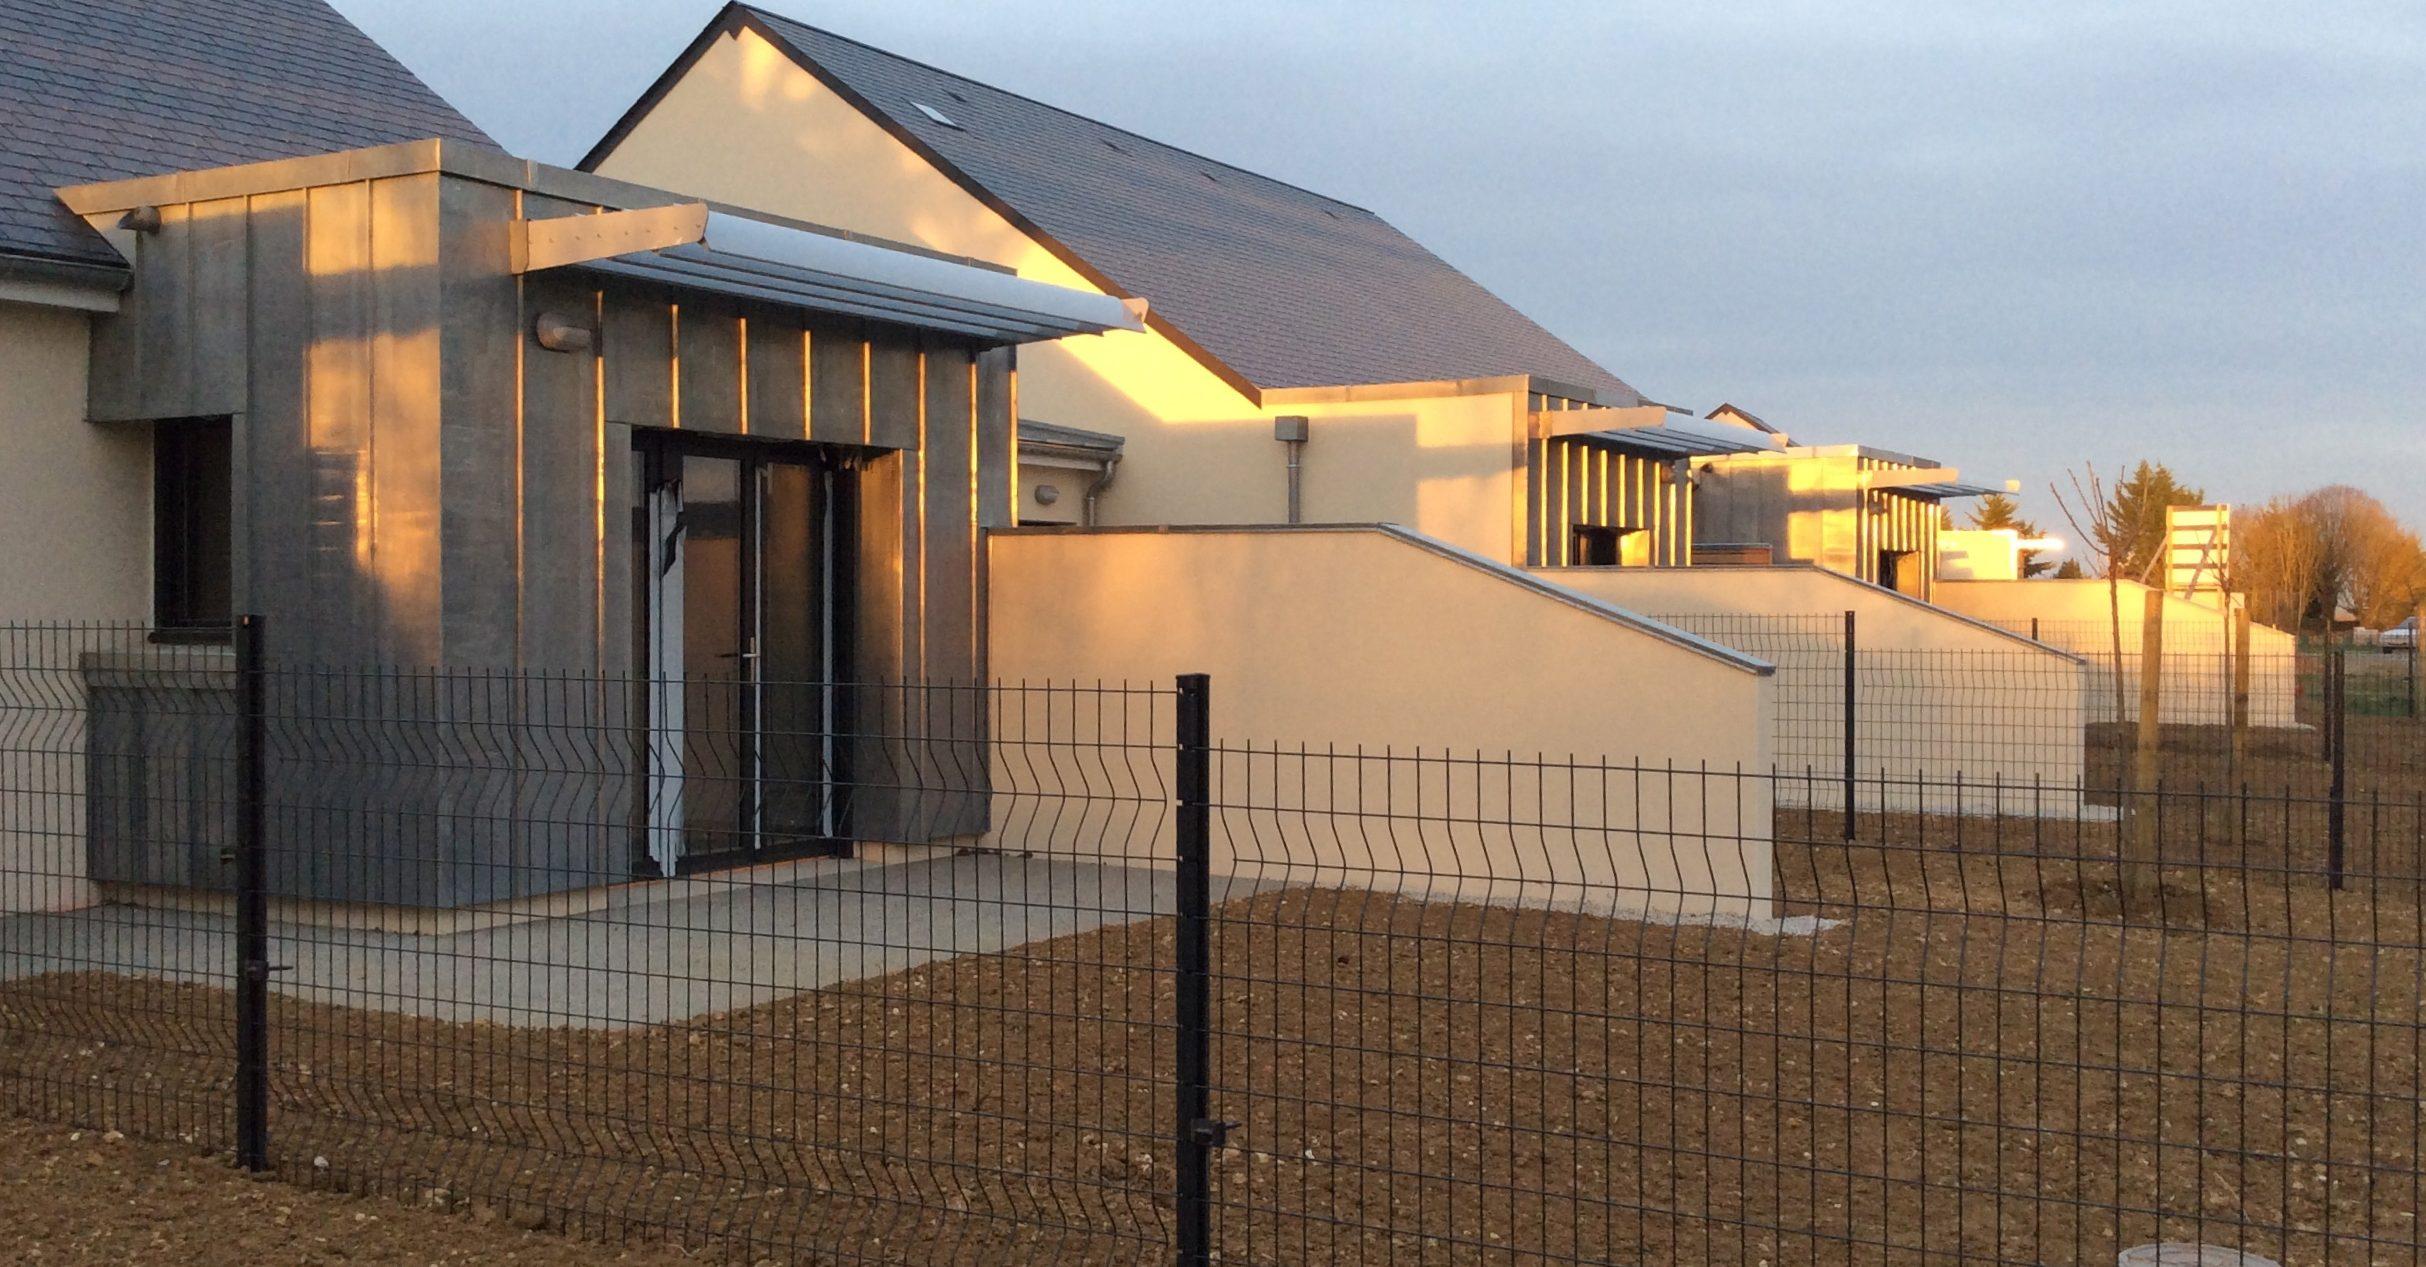 Logements Sociaux Adaptes Inauguration Souge Le Ganelon